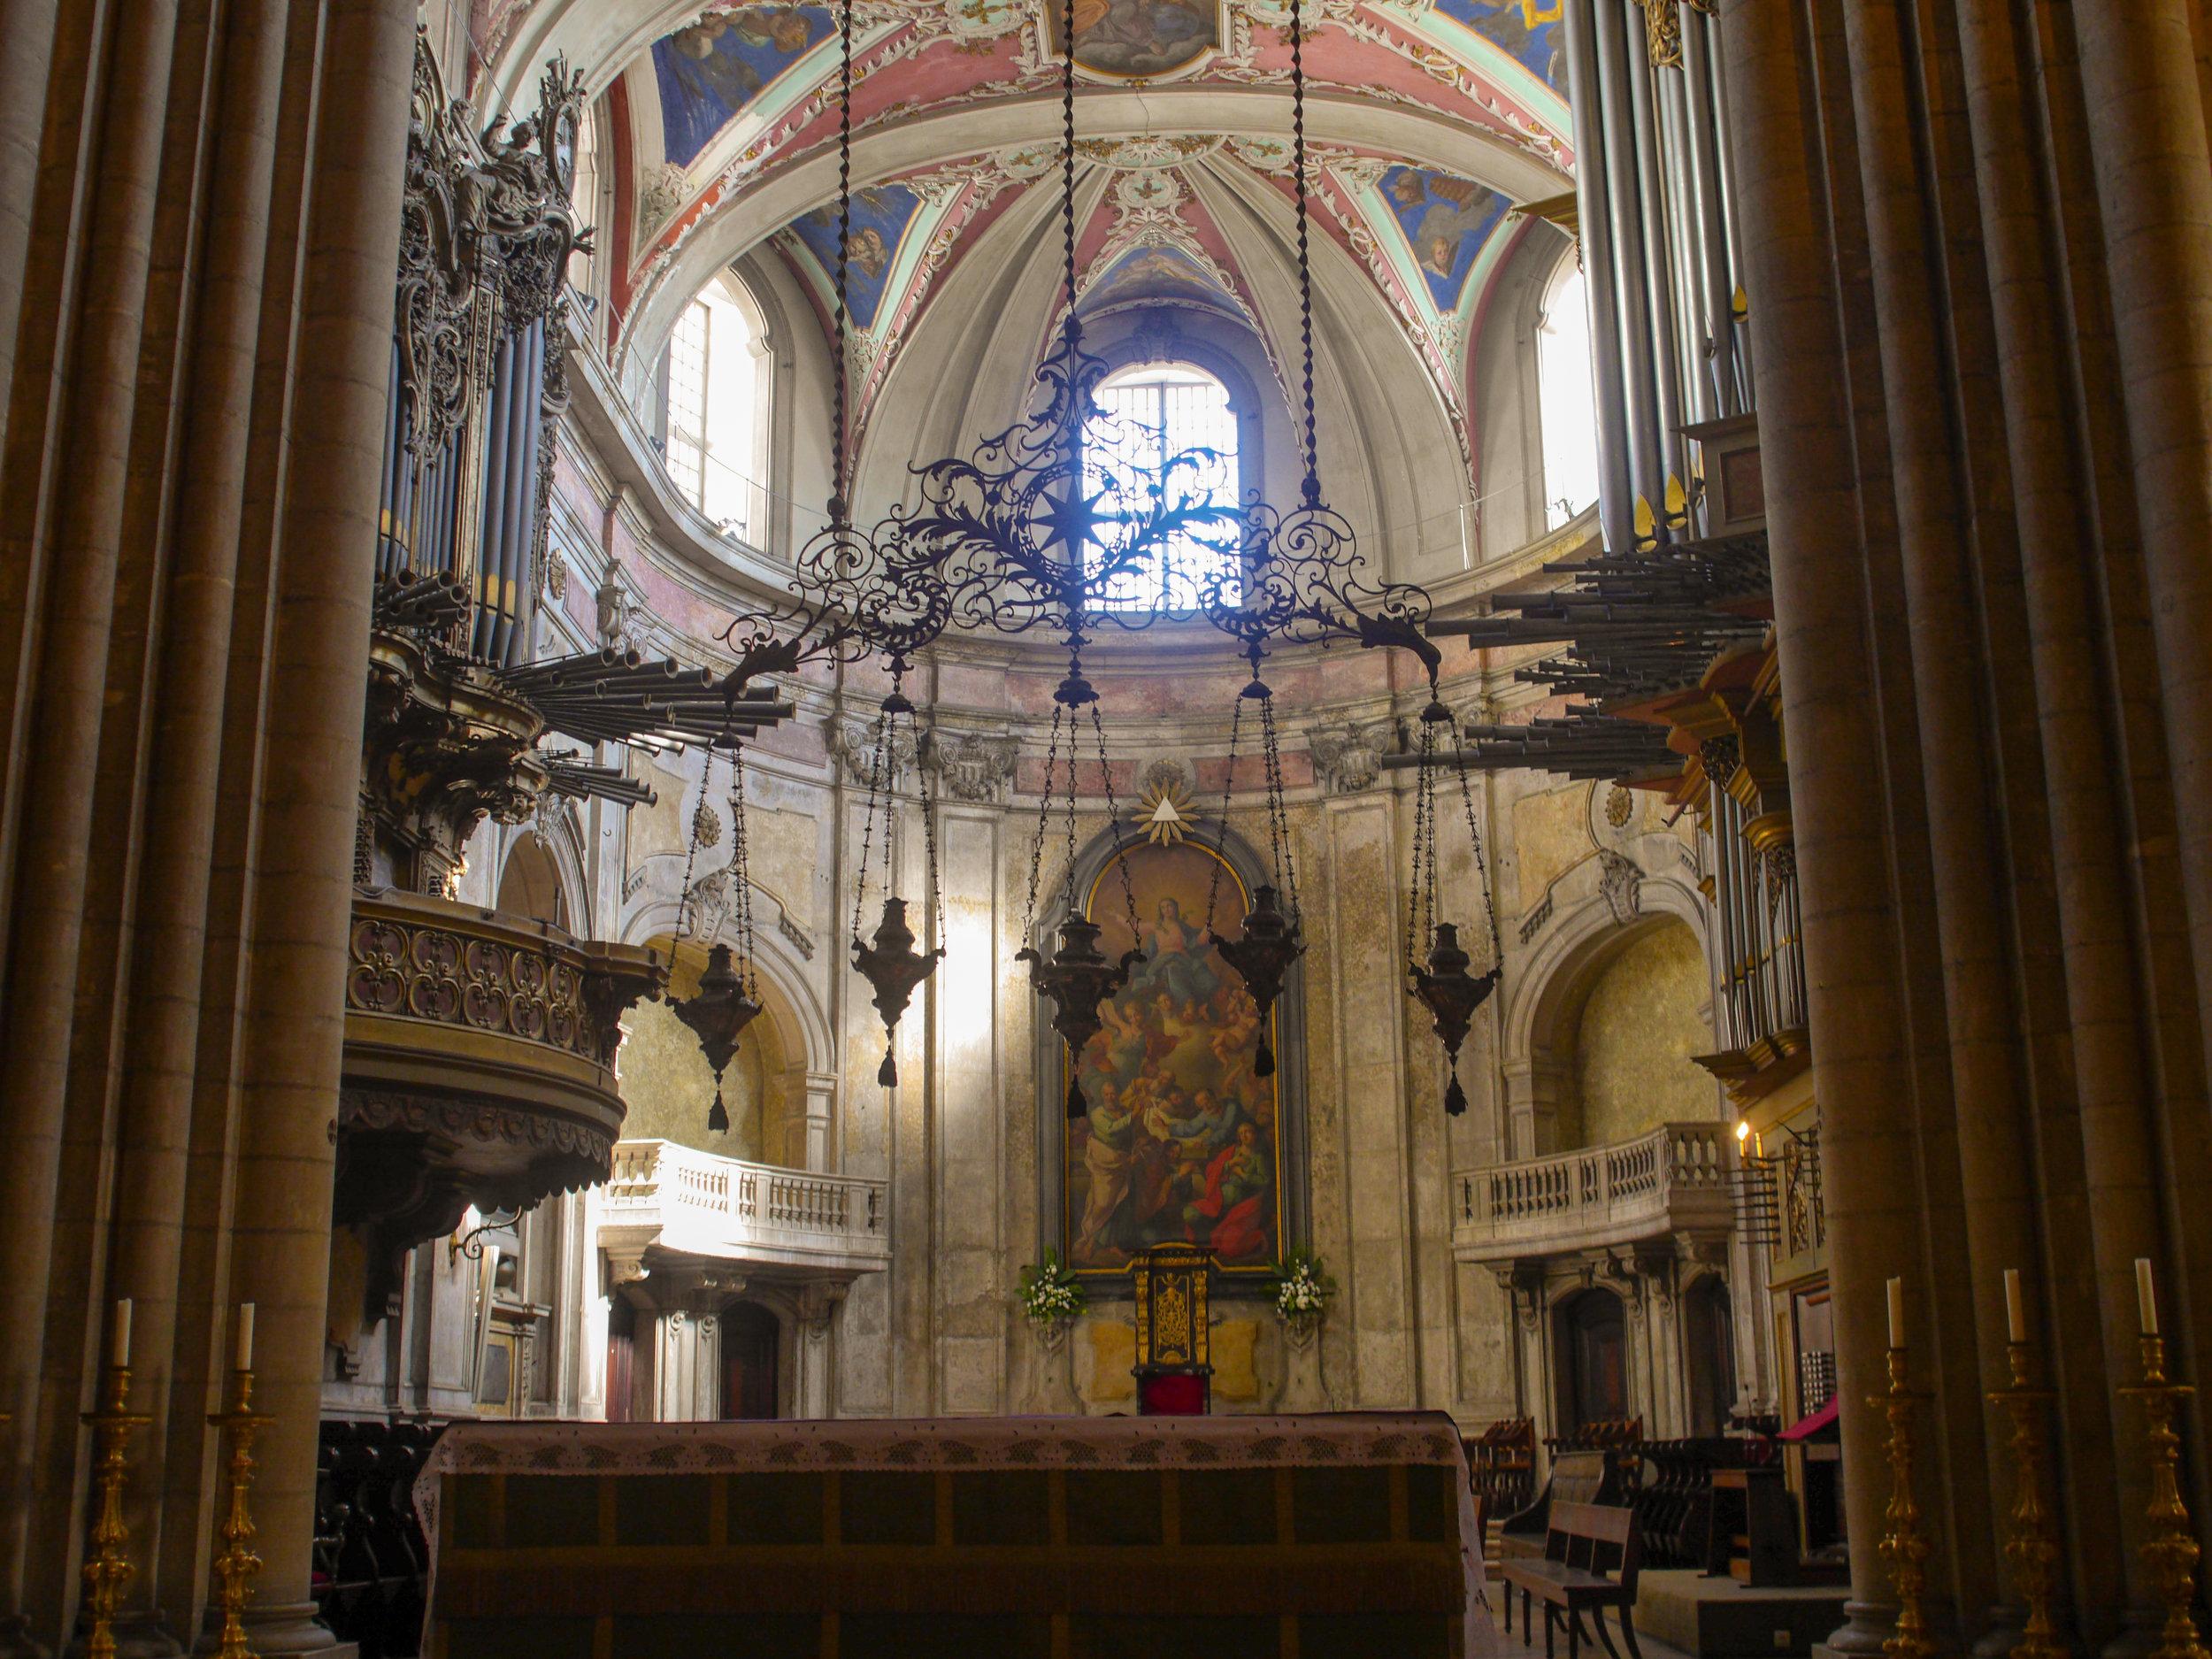 cathedralinsideedit (1 of 1).jpg